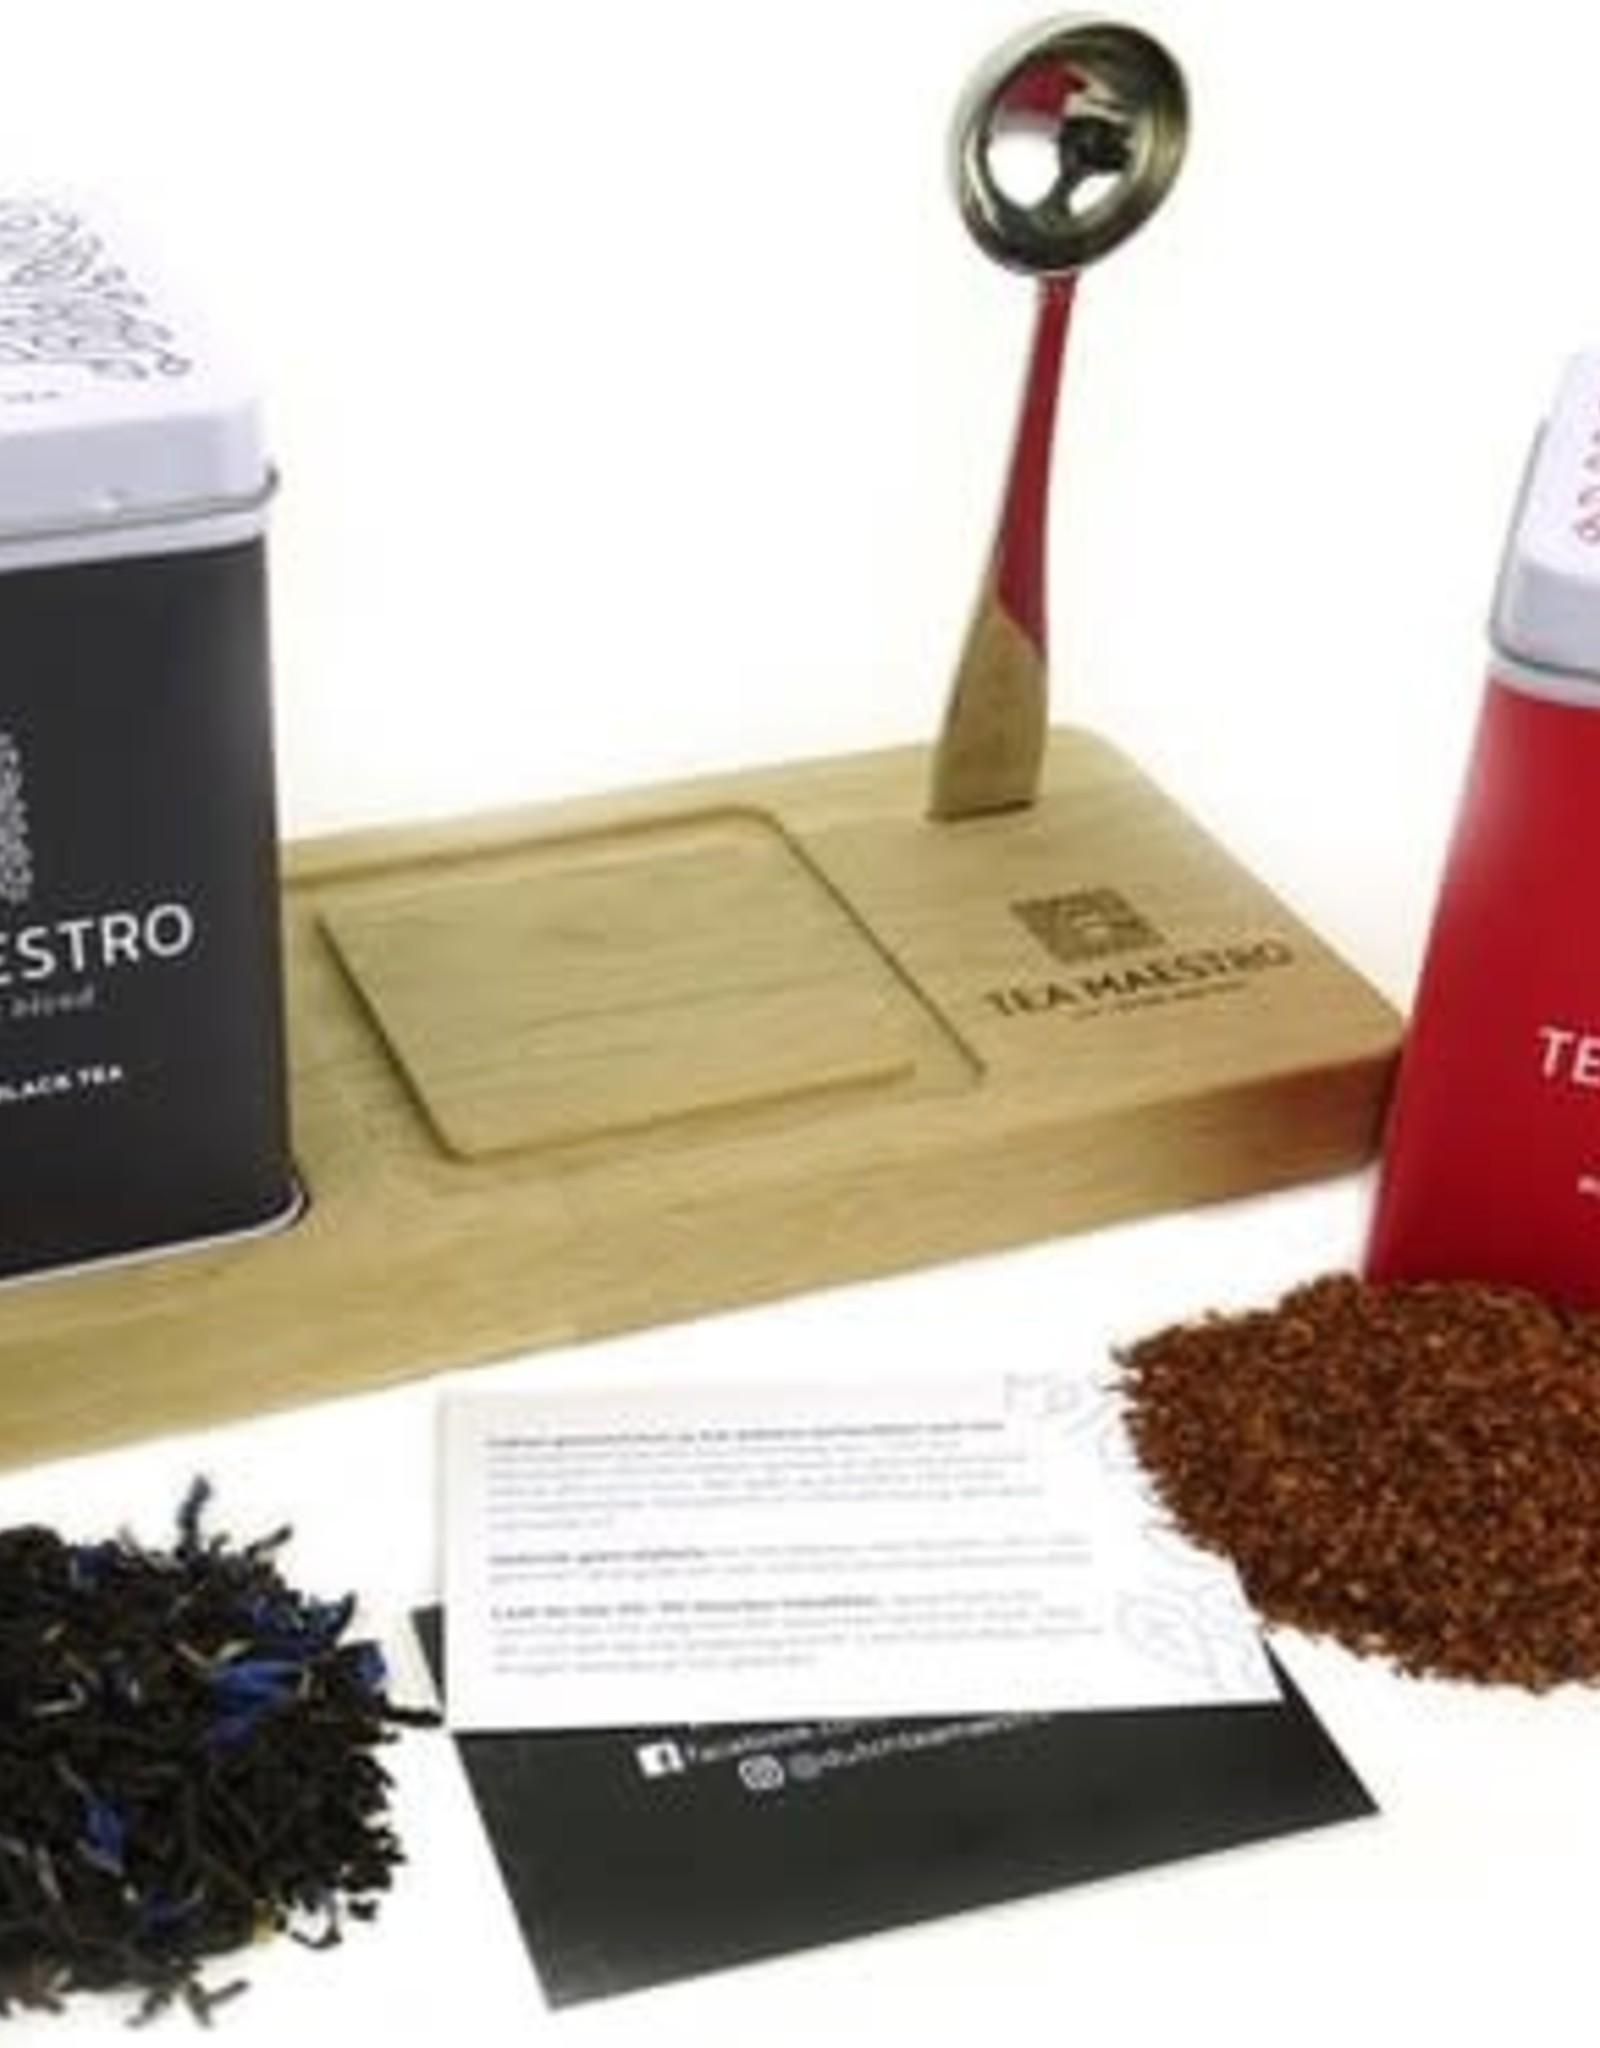 Dutch Tea Maestro Tea EARL GREY - Blend in Blik 80 gr